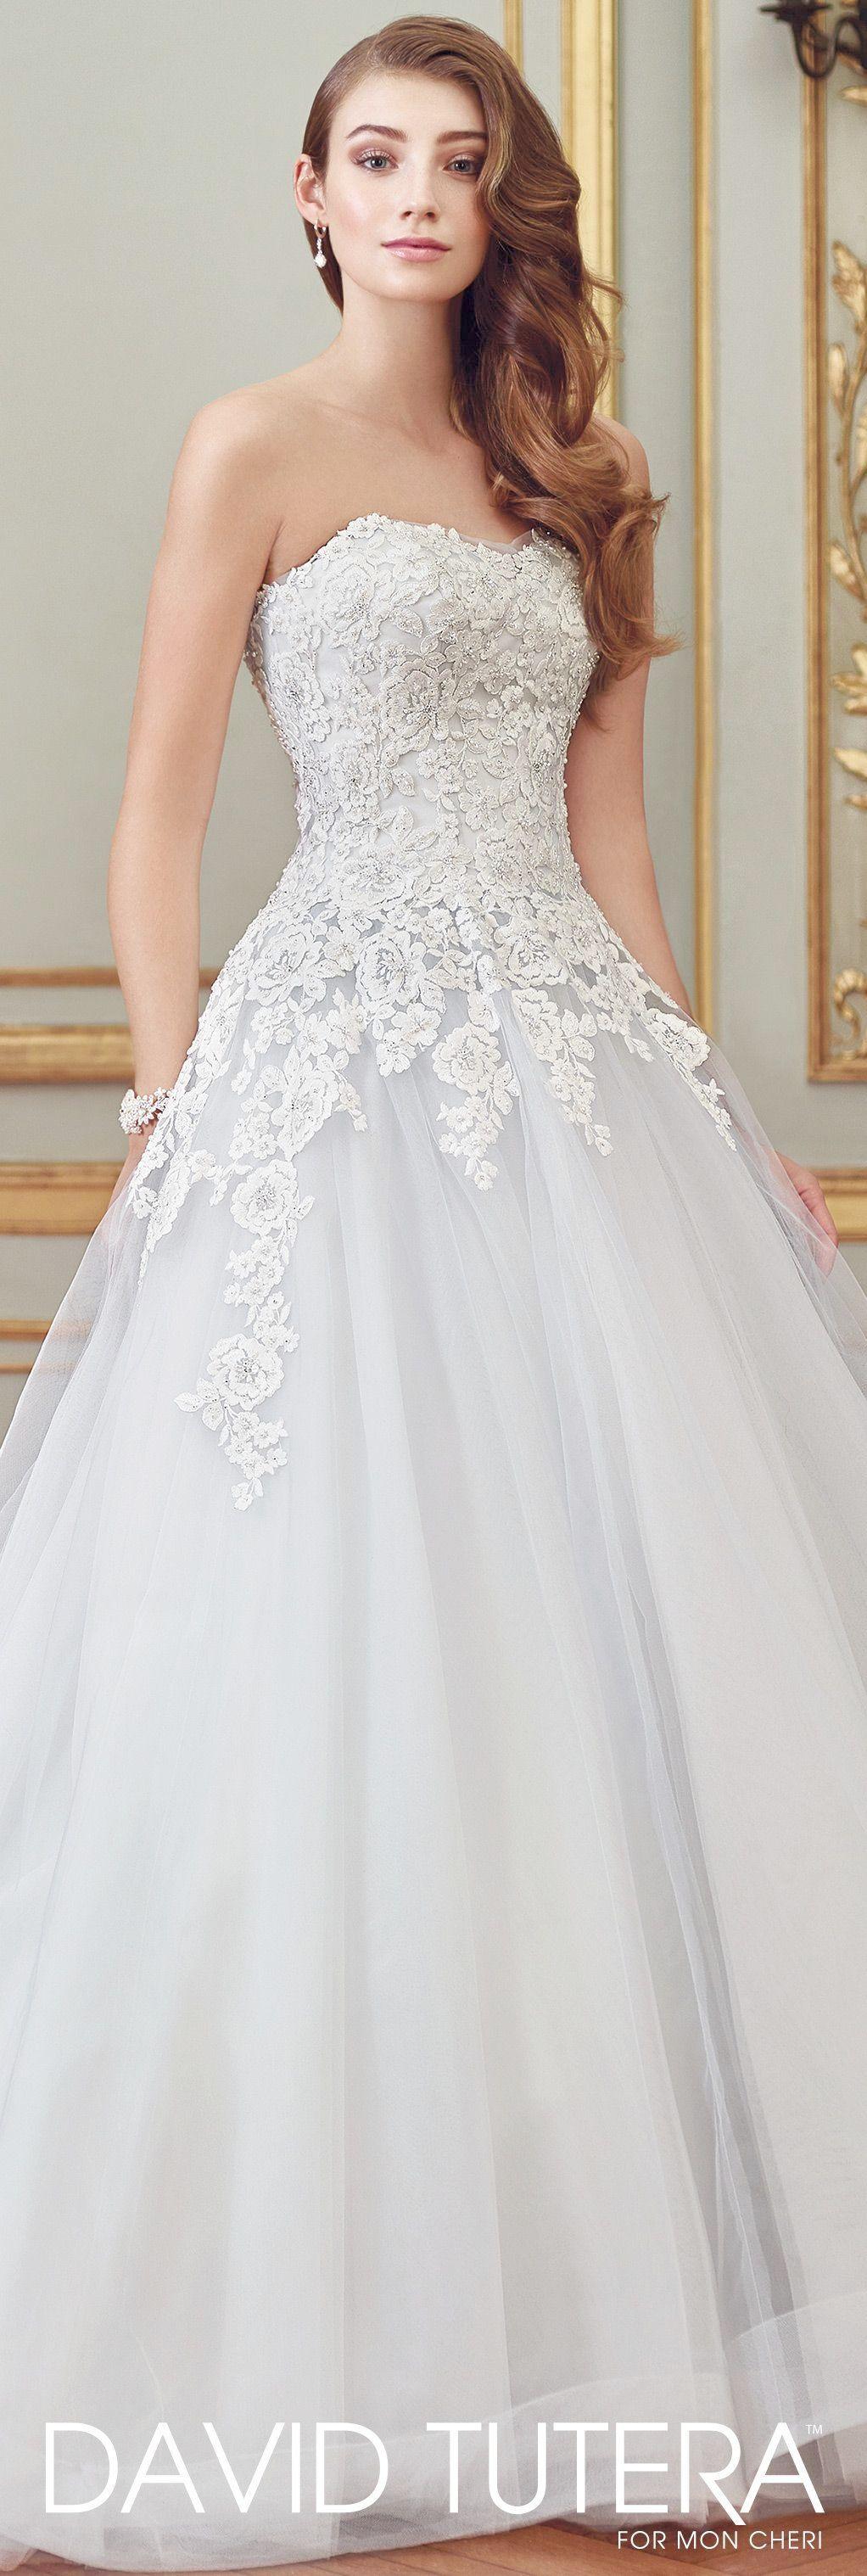 Mermaid wedding dress with detachable train  Lace Wedding Dress Detachable Train Tiered Lace Mermaid Wedding